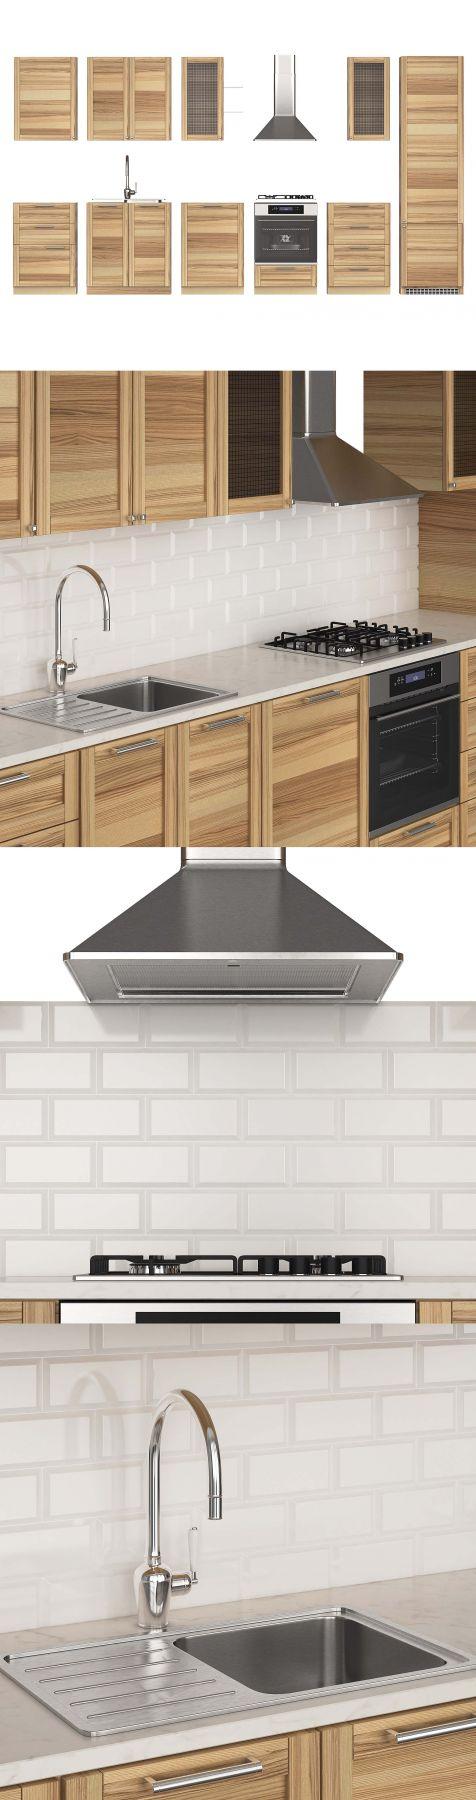 Kitchen Ikea Metod Torhamn 3d Model For Vray Corona